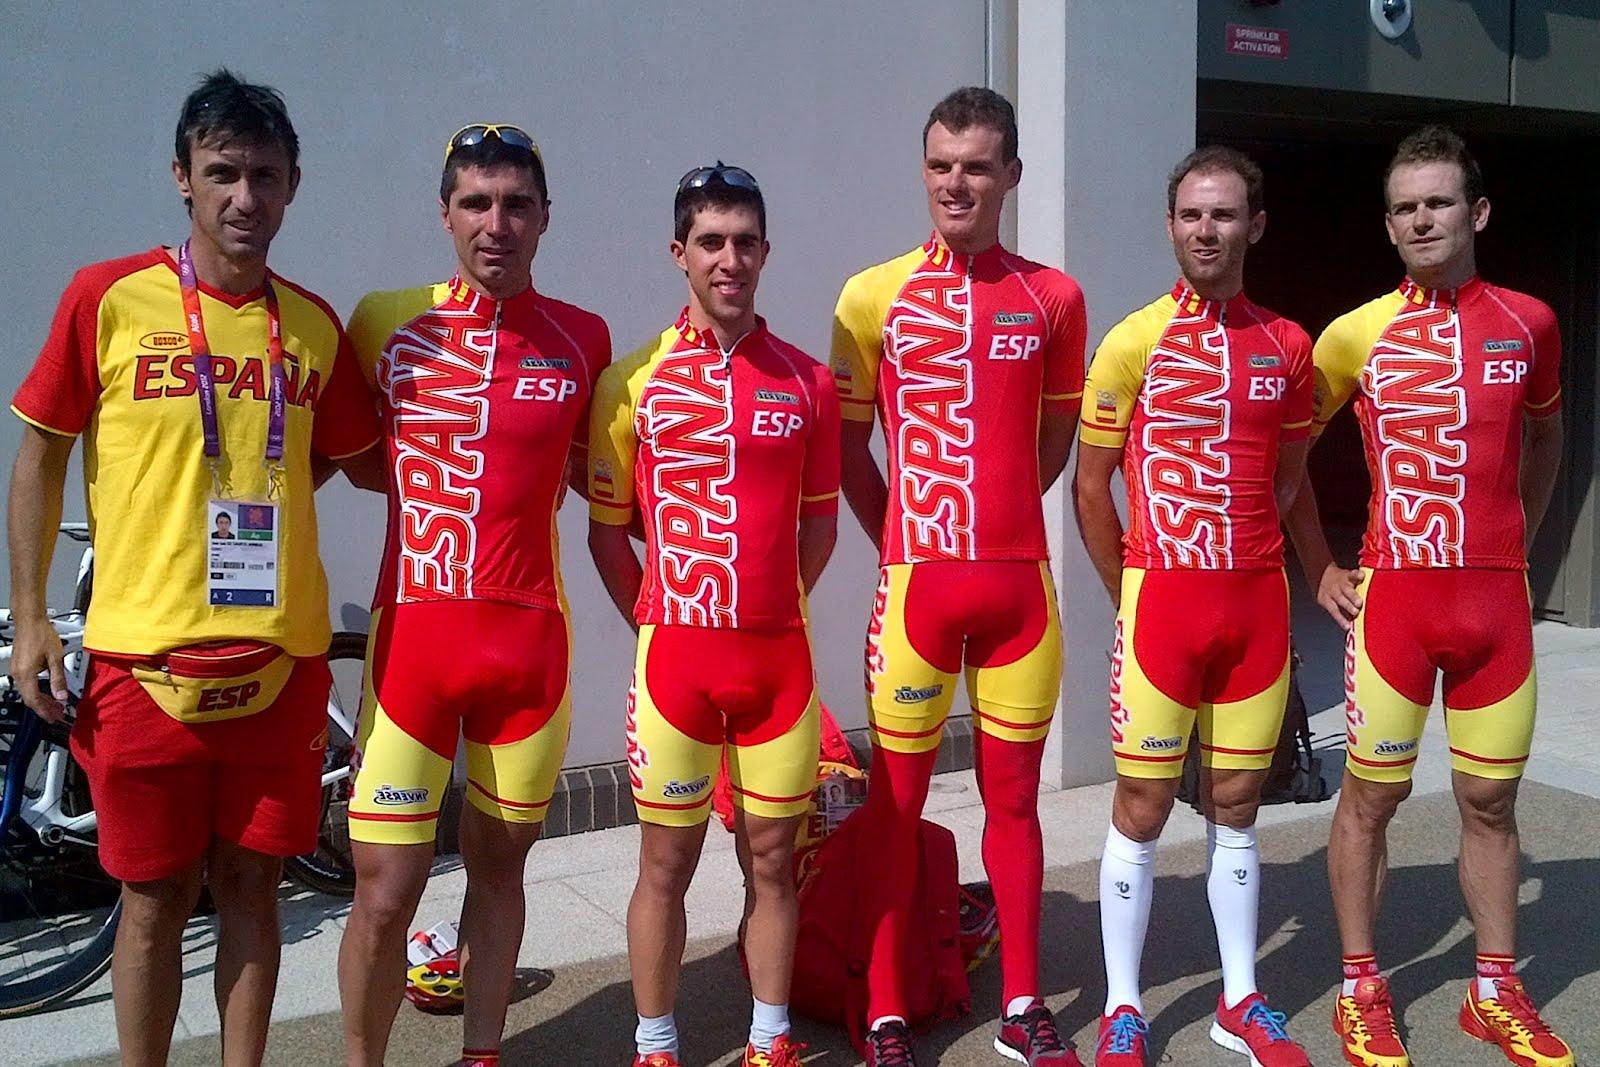 Bilderesultat for bultos de ciclistas